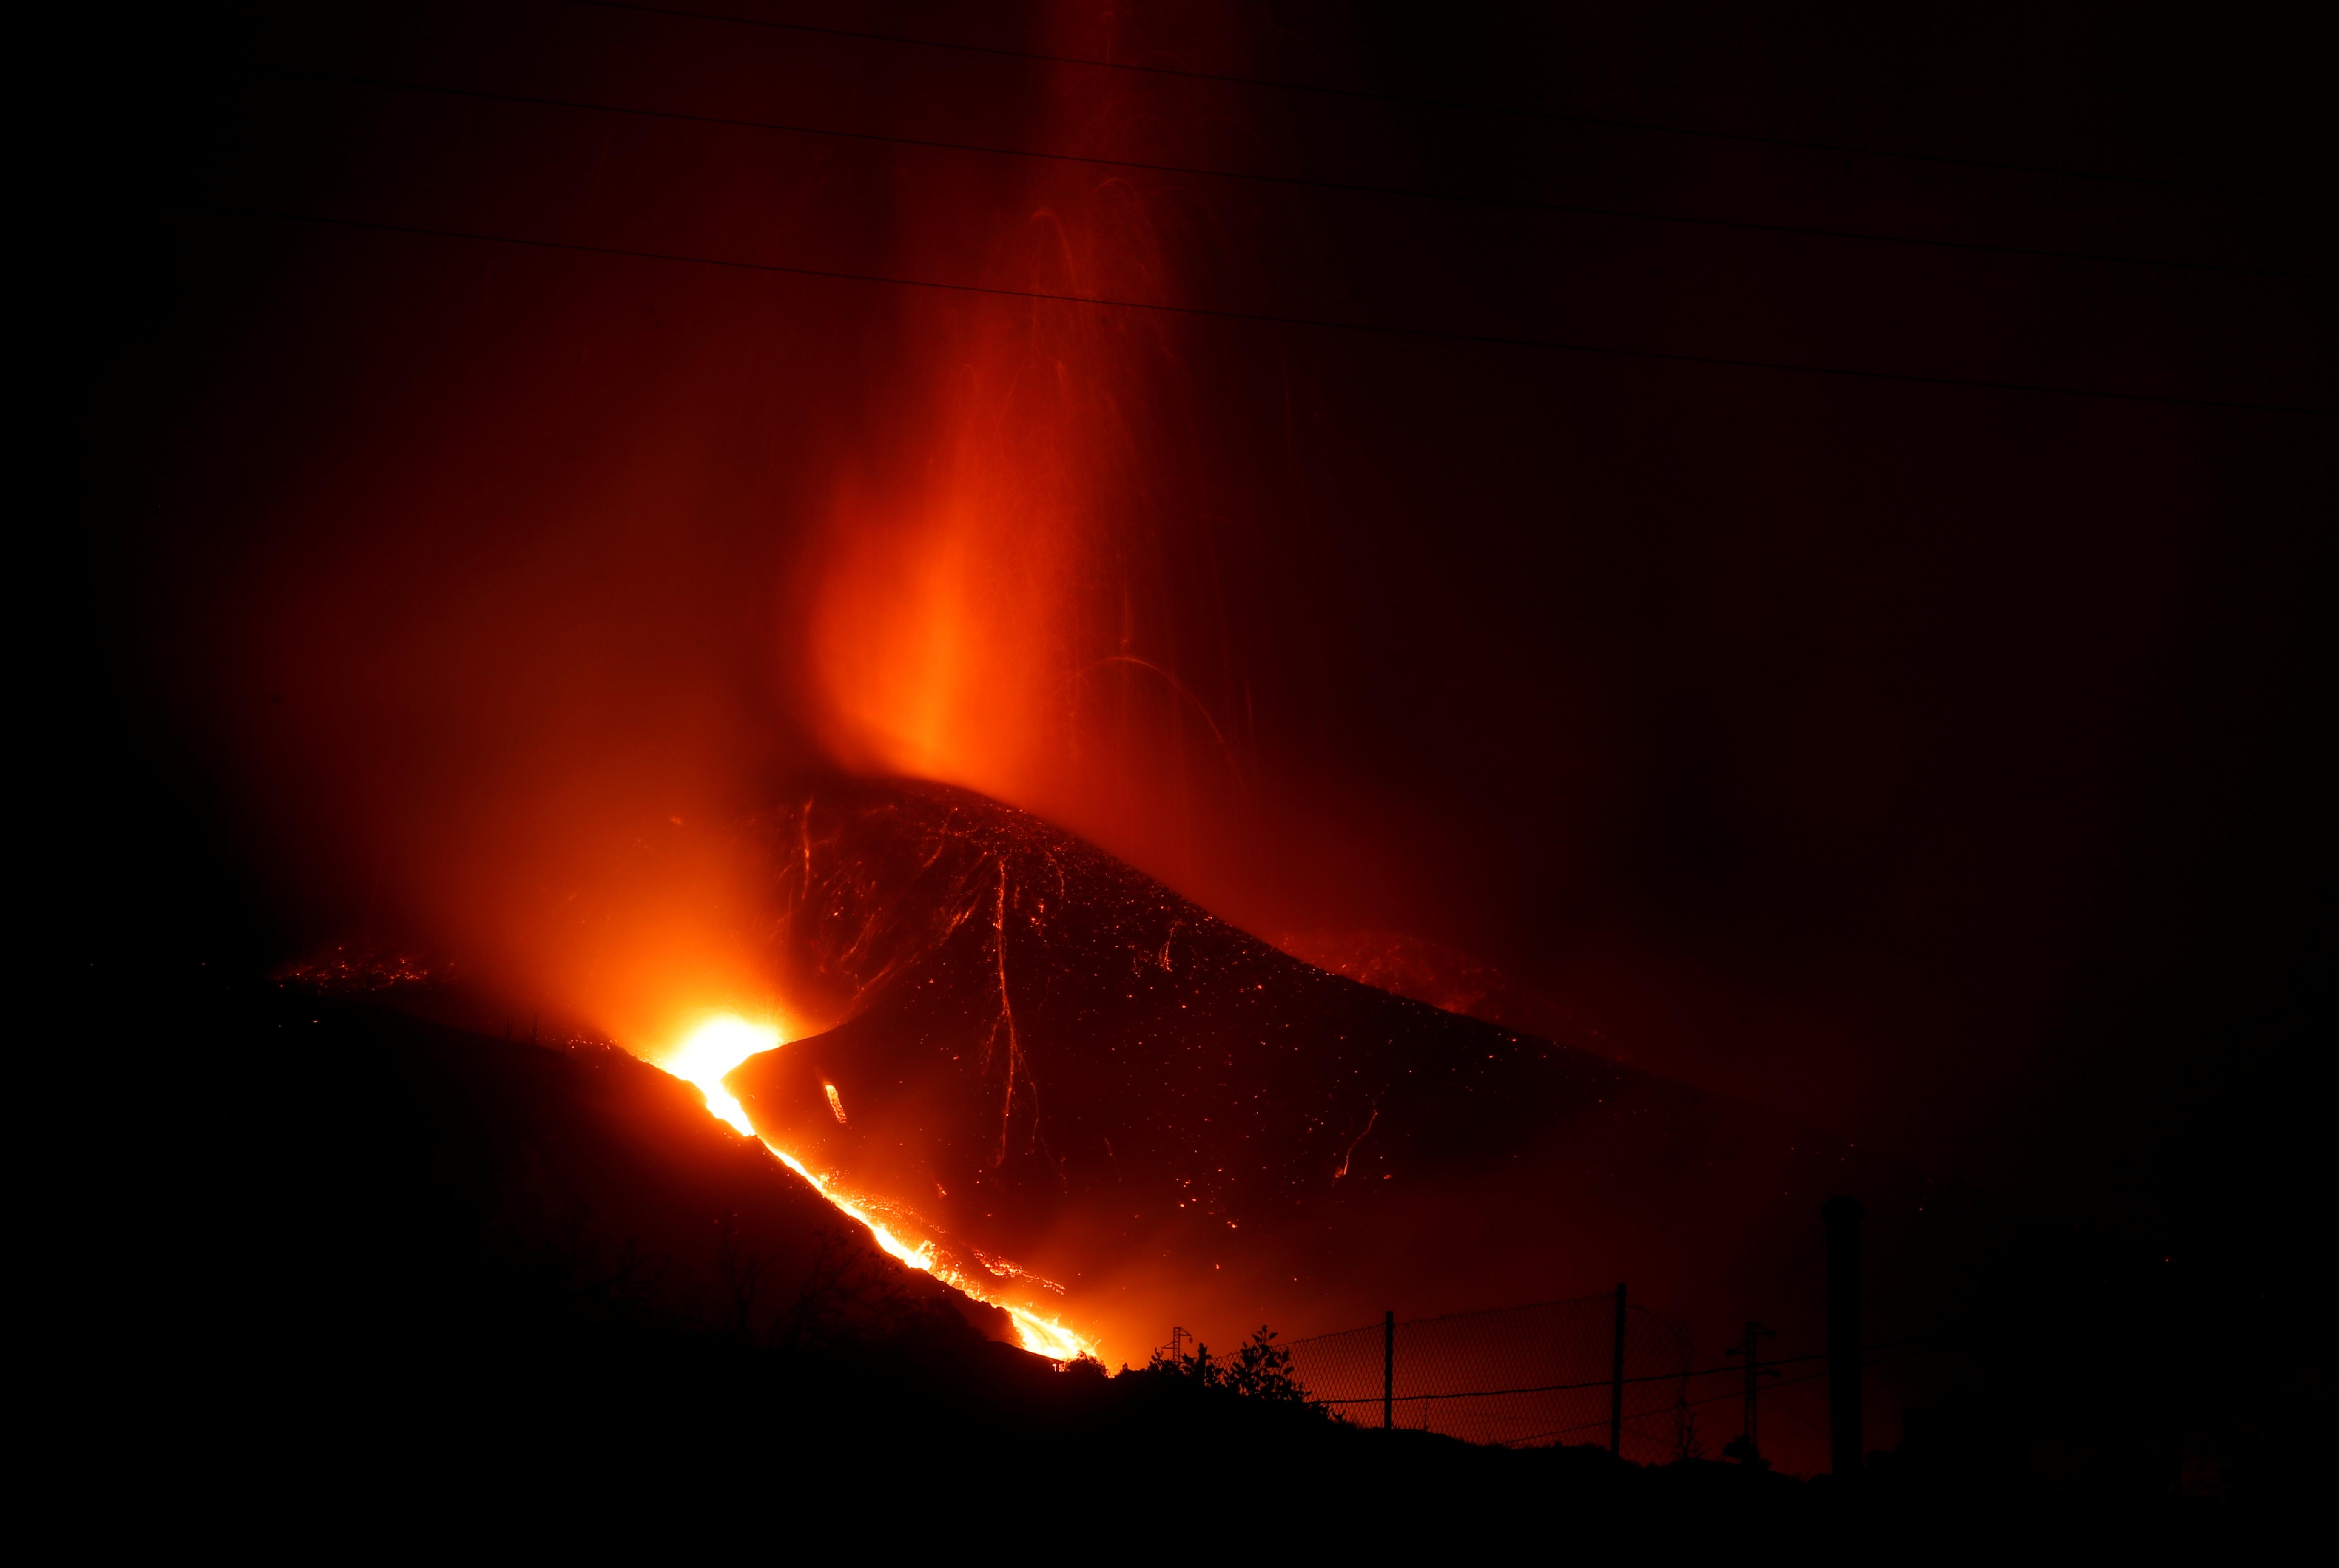 Lava and smoke rise following the eruption of a volcano on the Canary Island of La Palma, in La Laguna, Spain, September 24, 2021. REUTERS/Jon Nazca